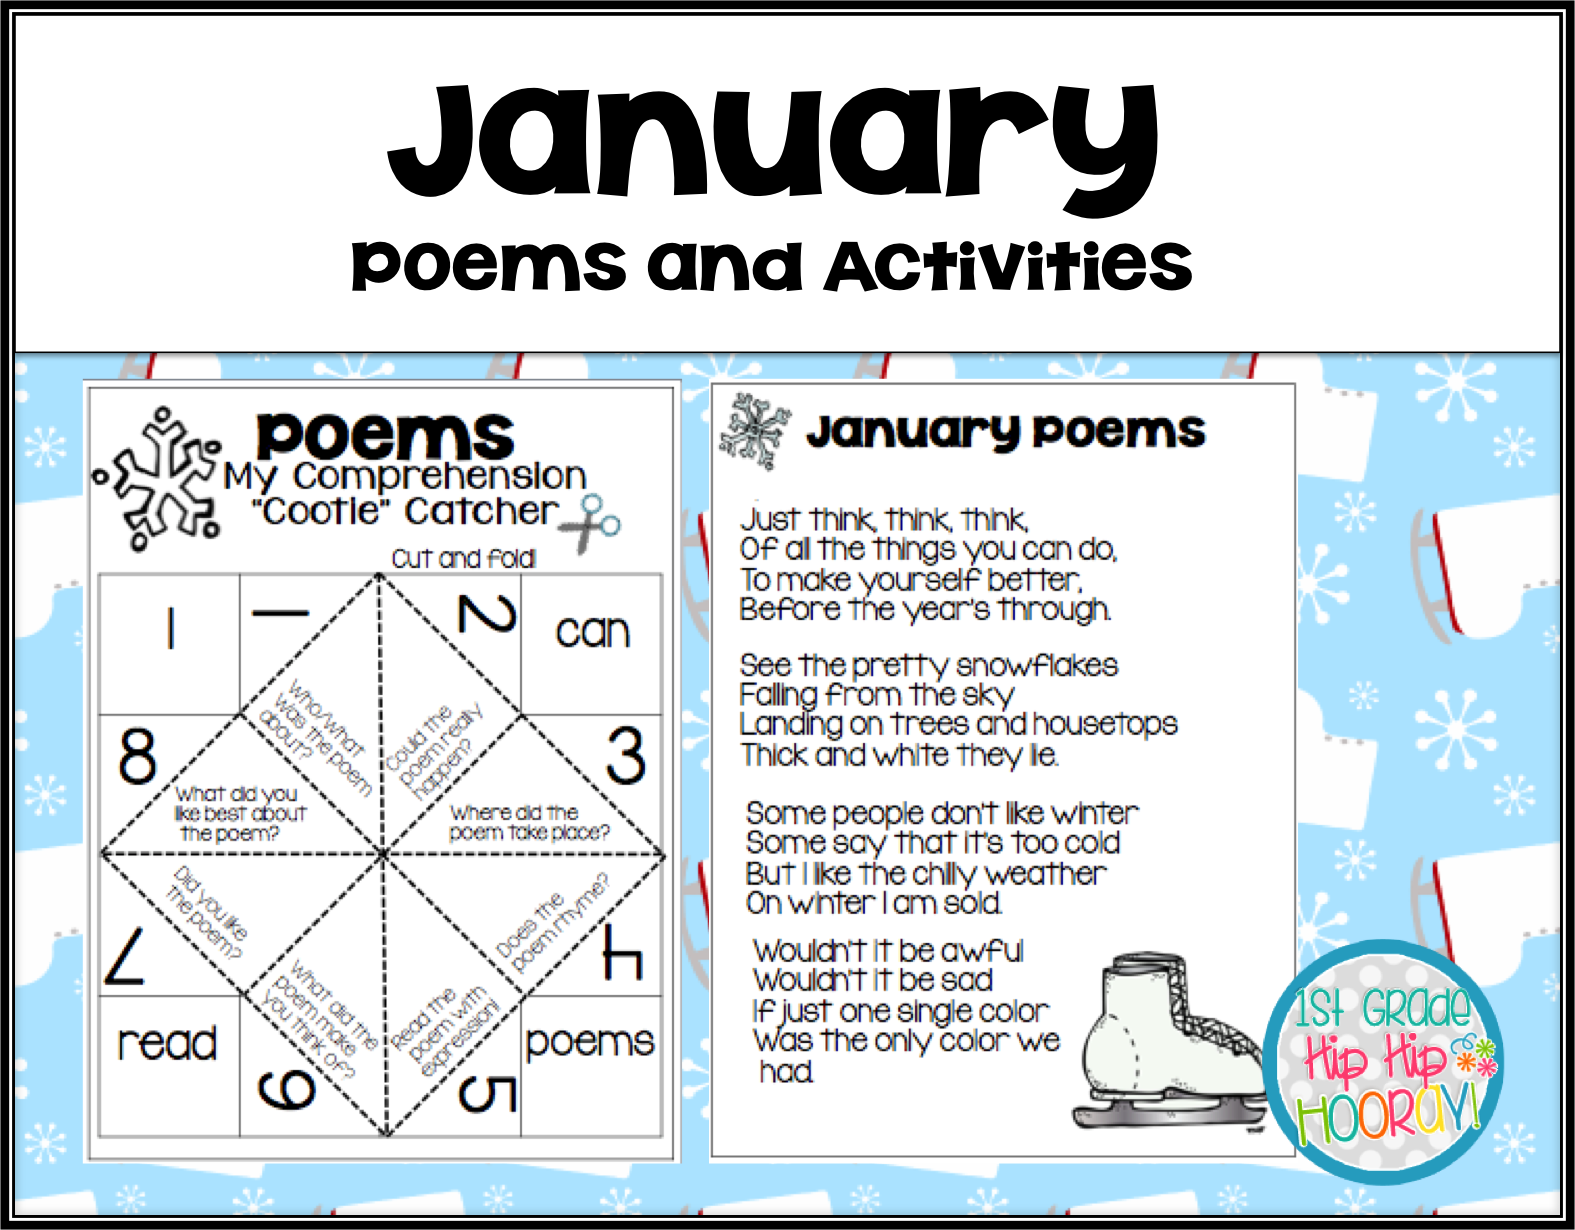 1st Grade Hip Hip Hooray January Poems And Activities